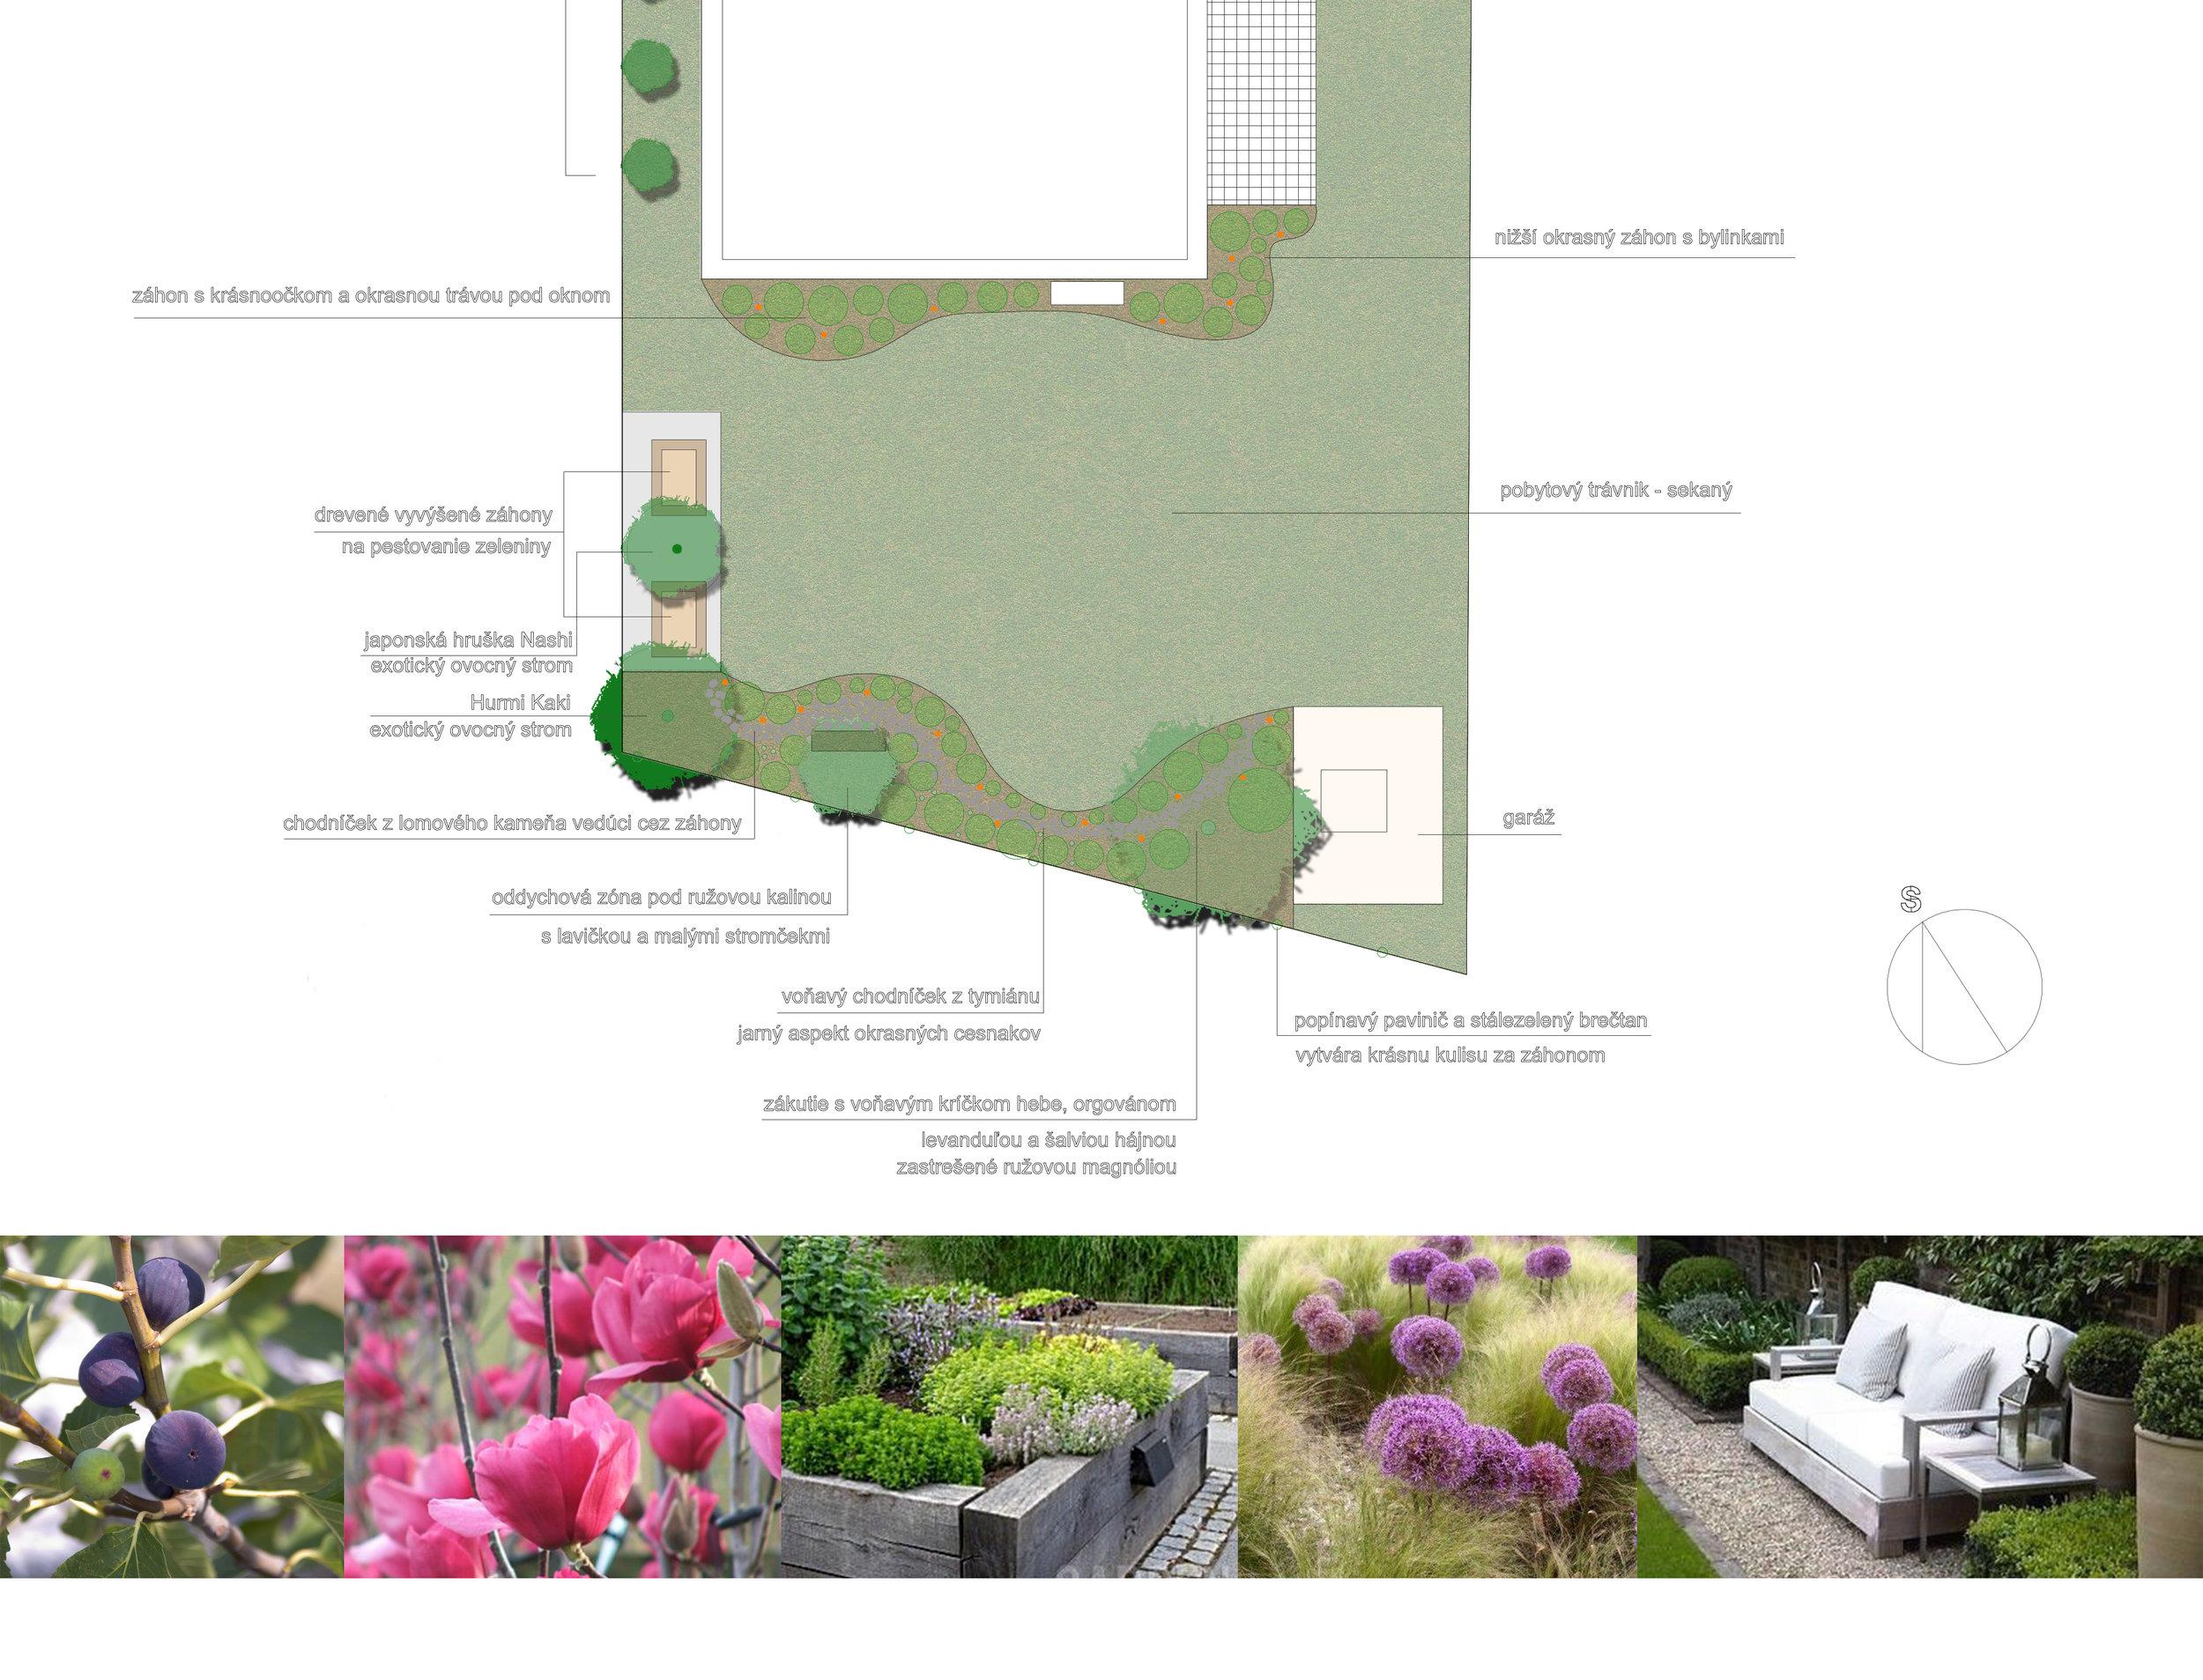 zahrada podorys trnava